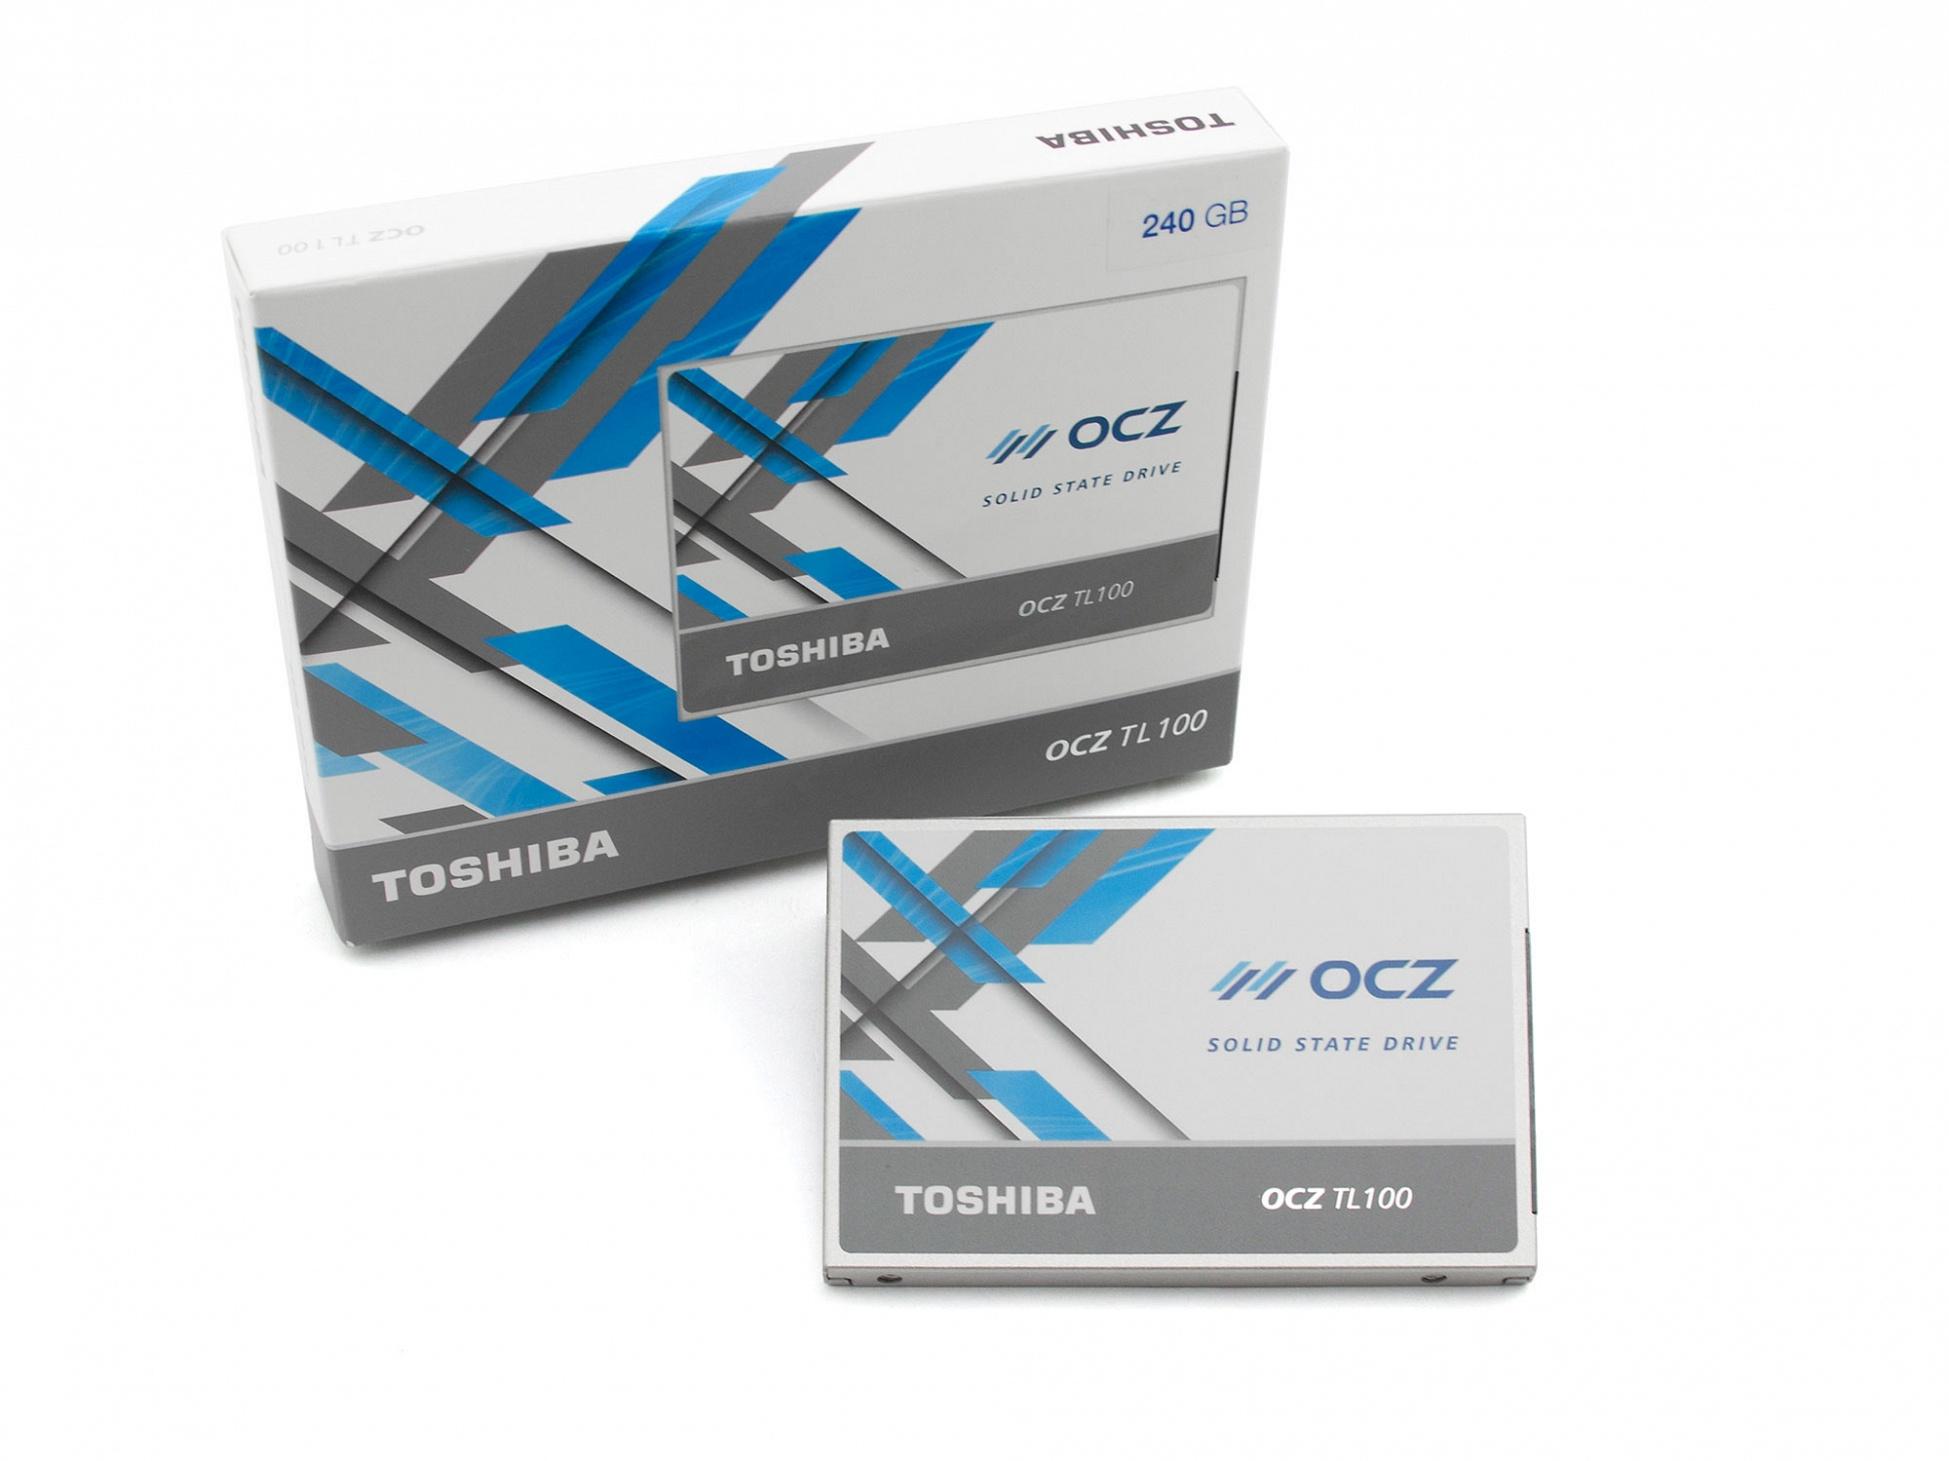 Festplatte SSD - 240GB OCZ TL100 für Wortmann Terra Mobile 1509